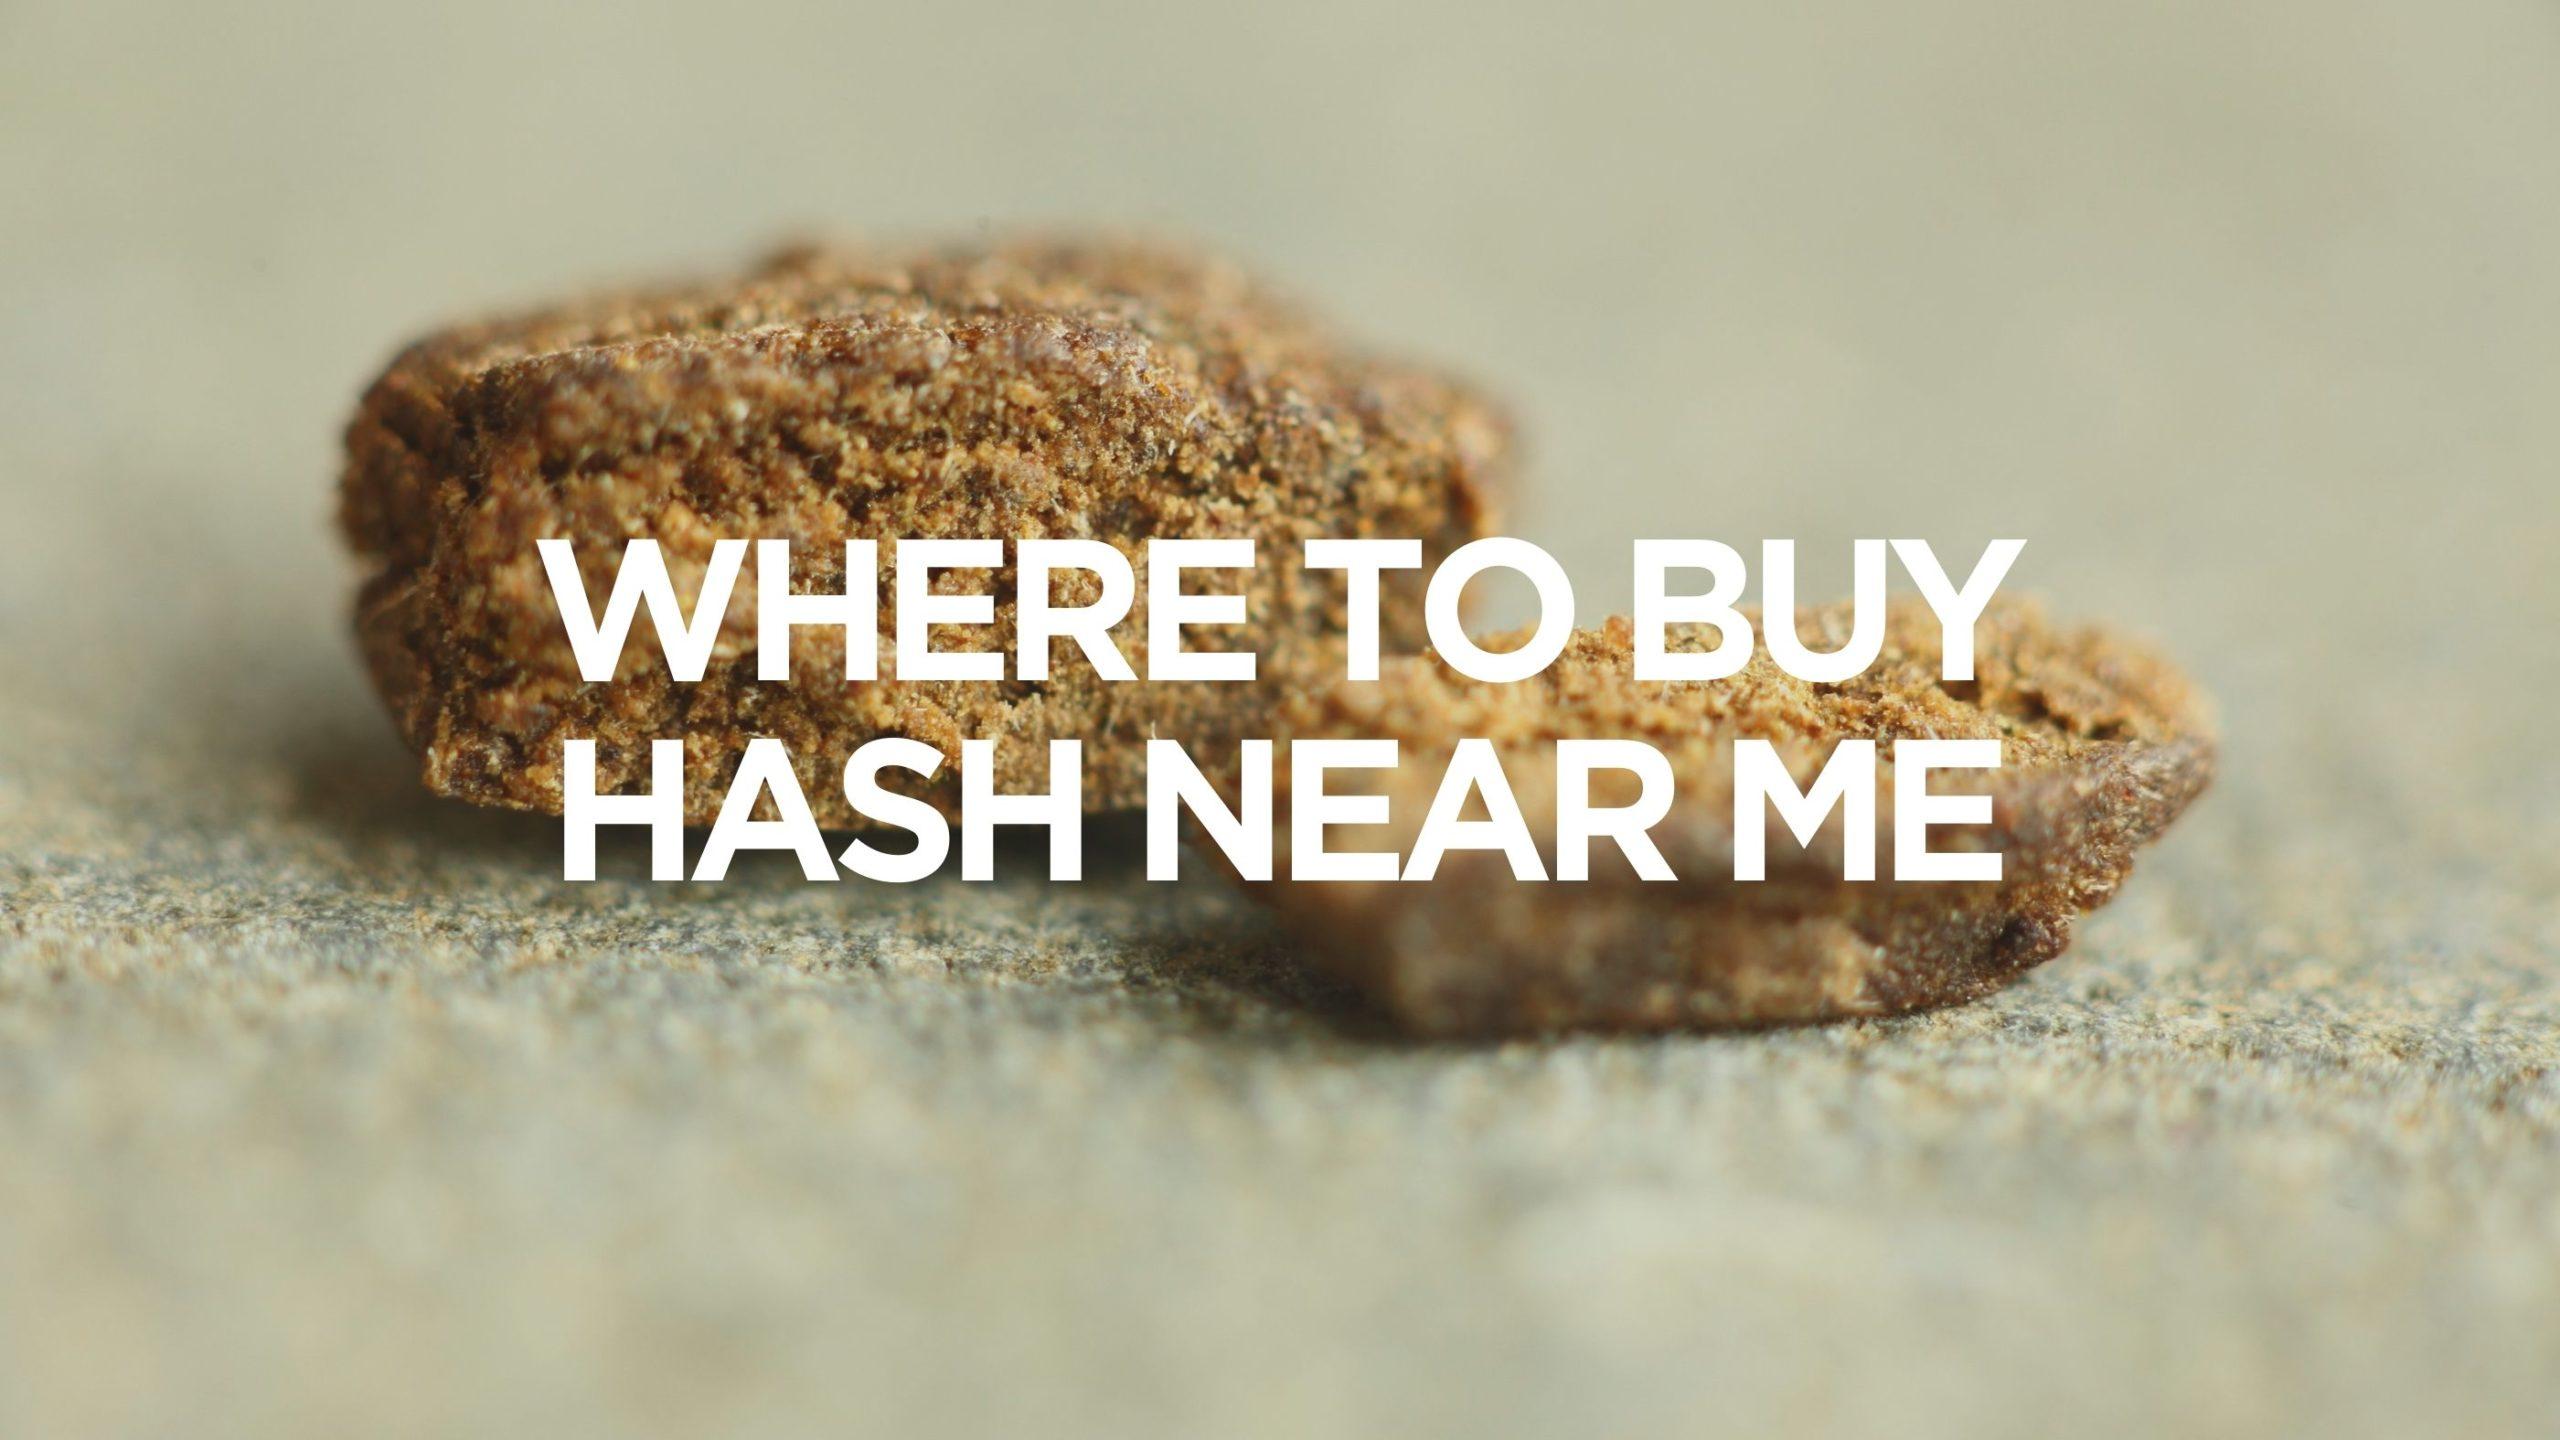 where-to-buy-hash-near-me